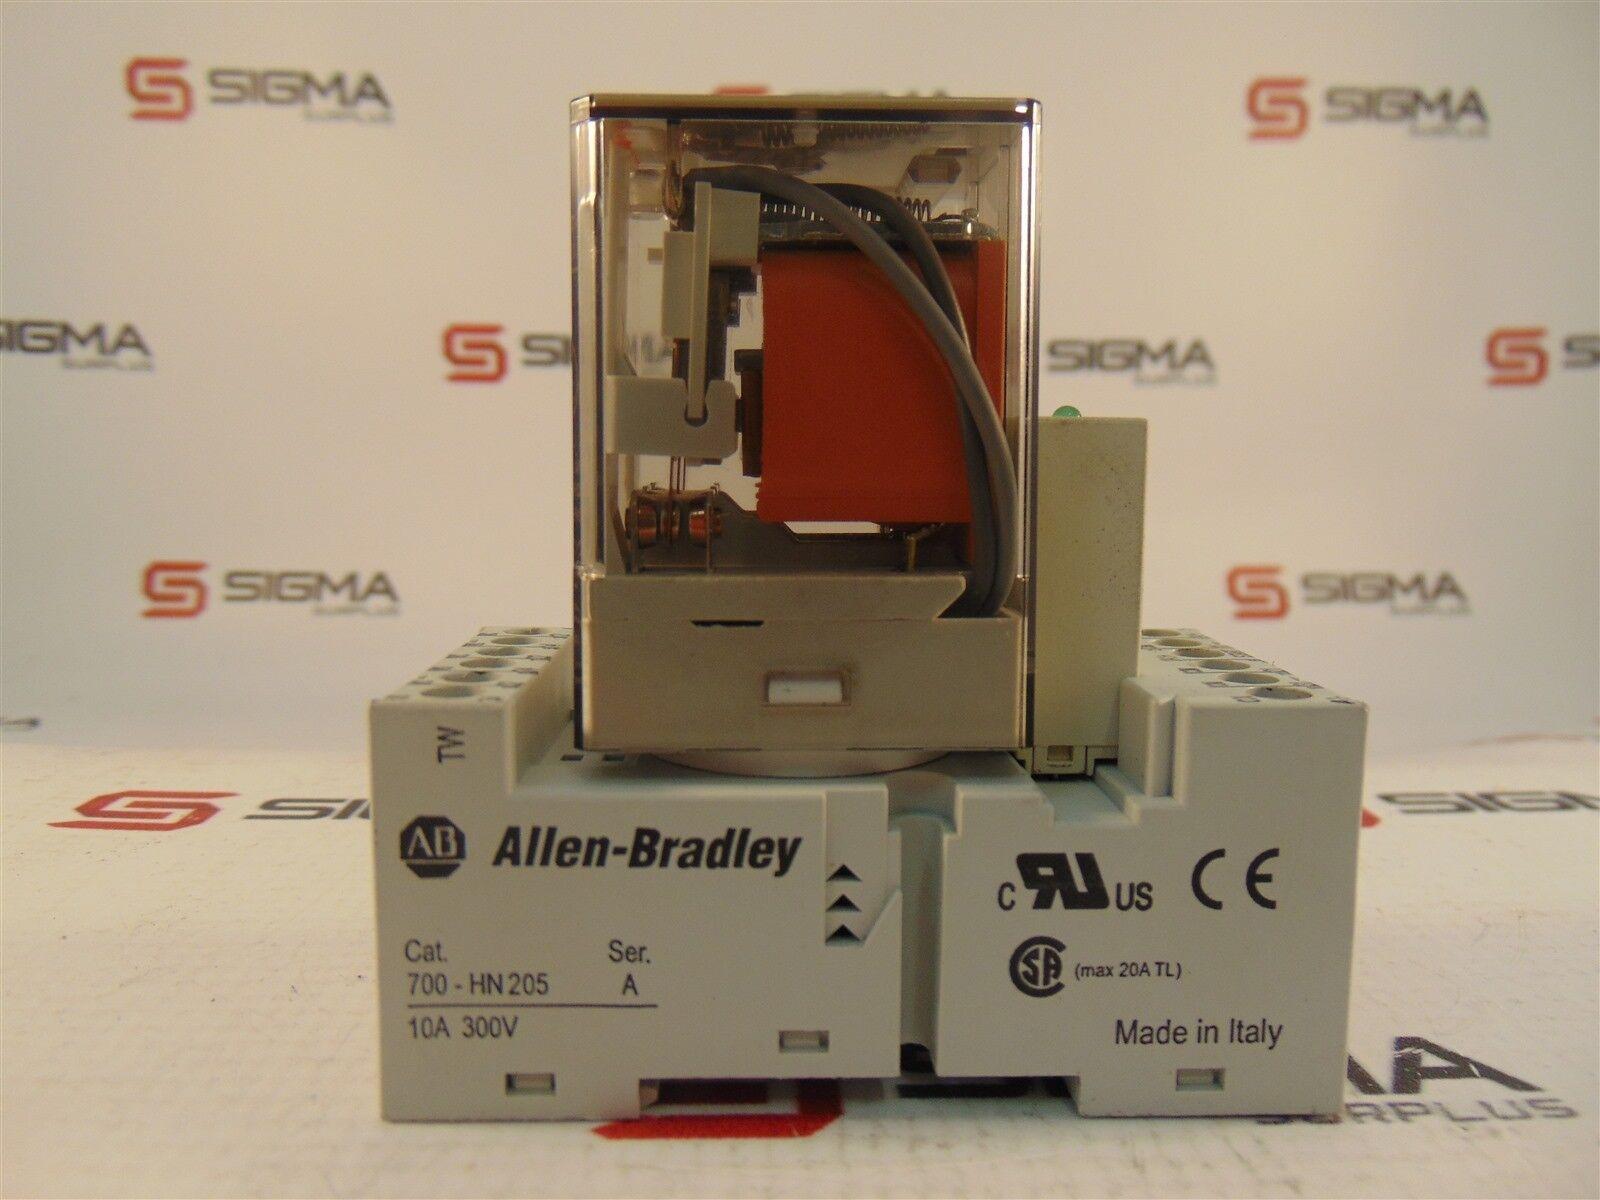 Allen-Bradley 700-HN205 Relay Base 300VAC 10A w/700-HA33A2 240VAC 10A